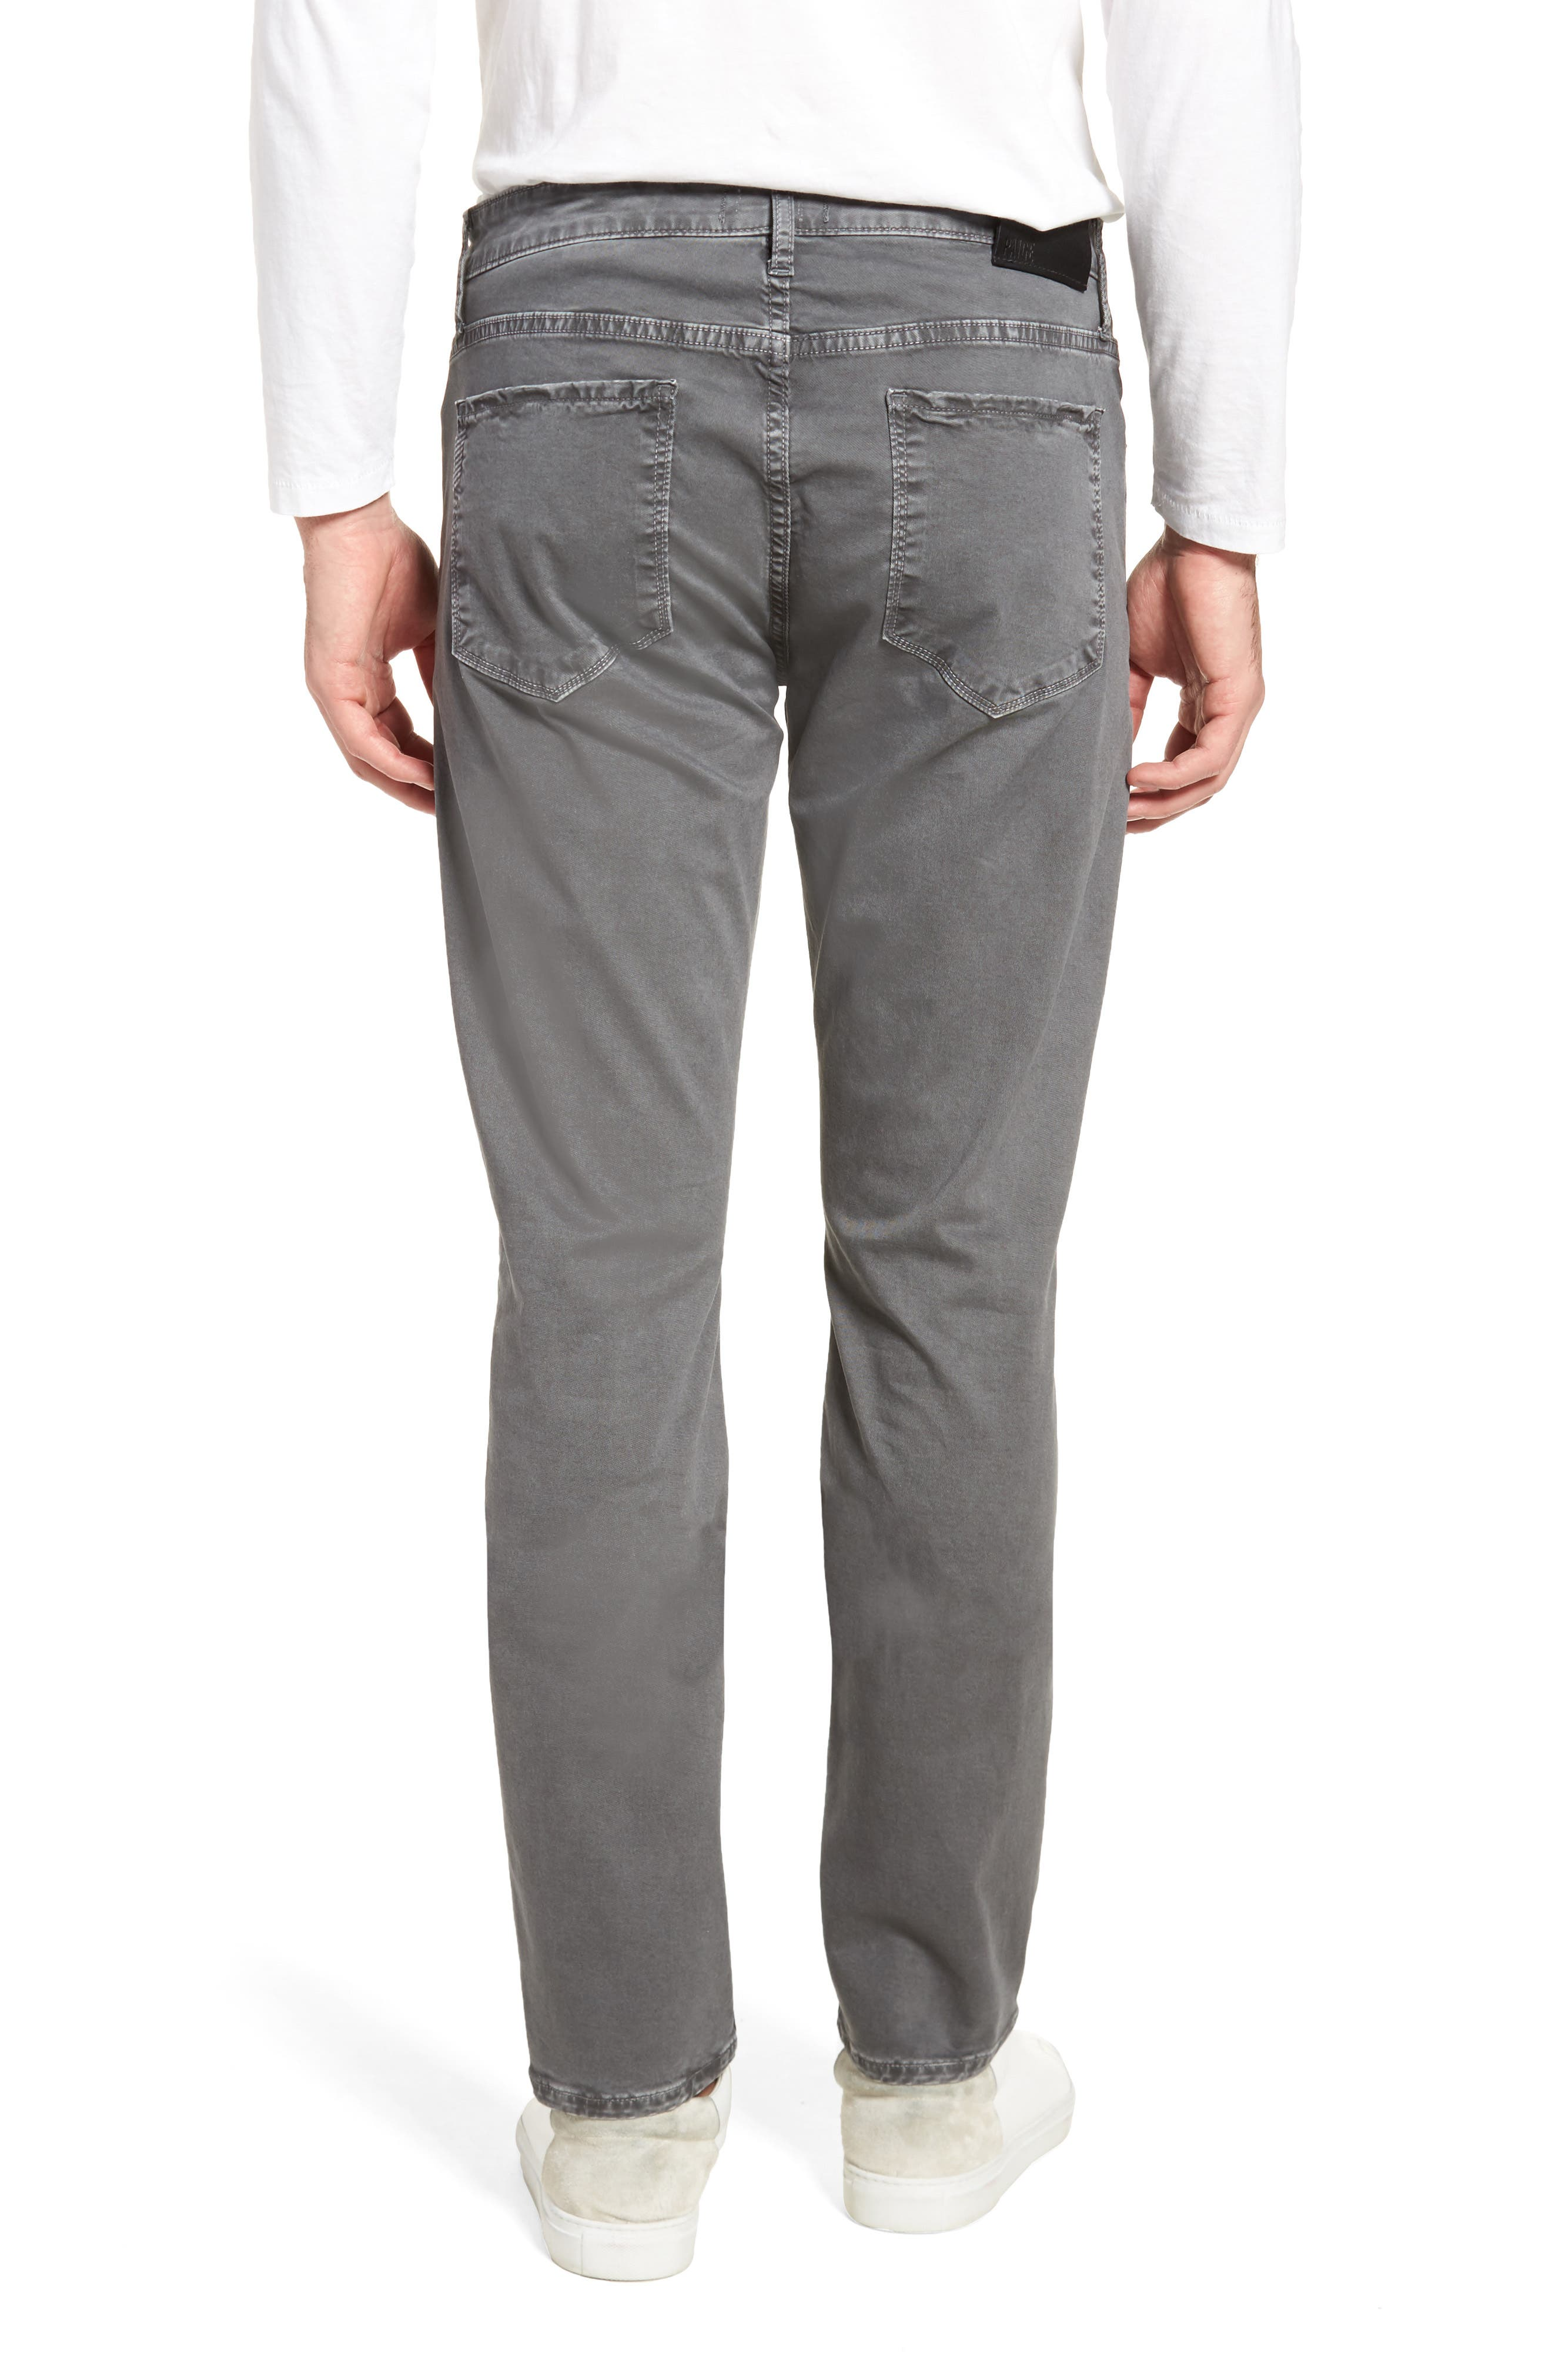 Lennox Slim Fit Five-Pocket Pants,                             Alternate thumbnail 2, color,                             VINTAGE THUNDER GREY